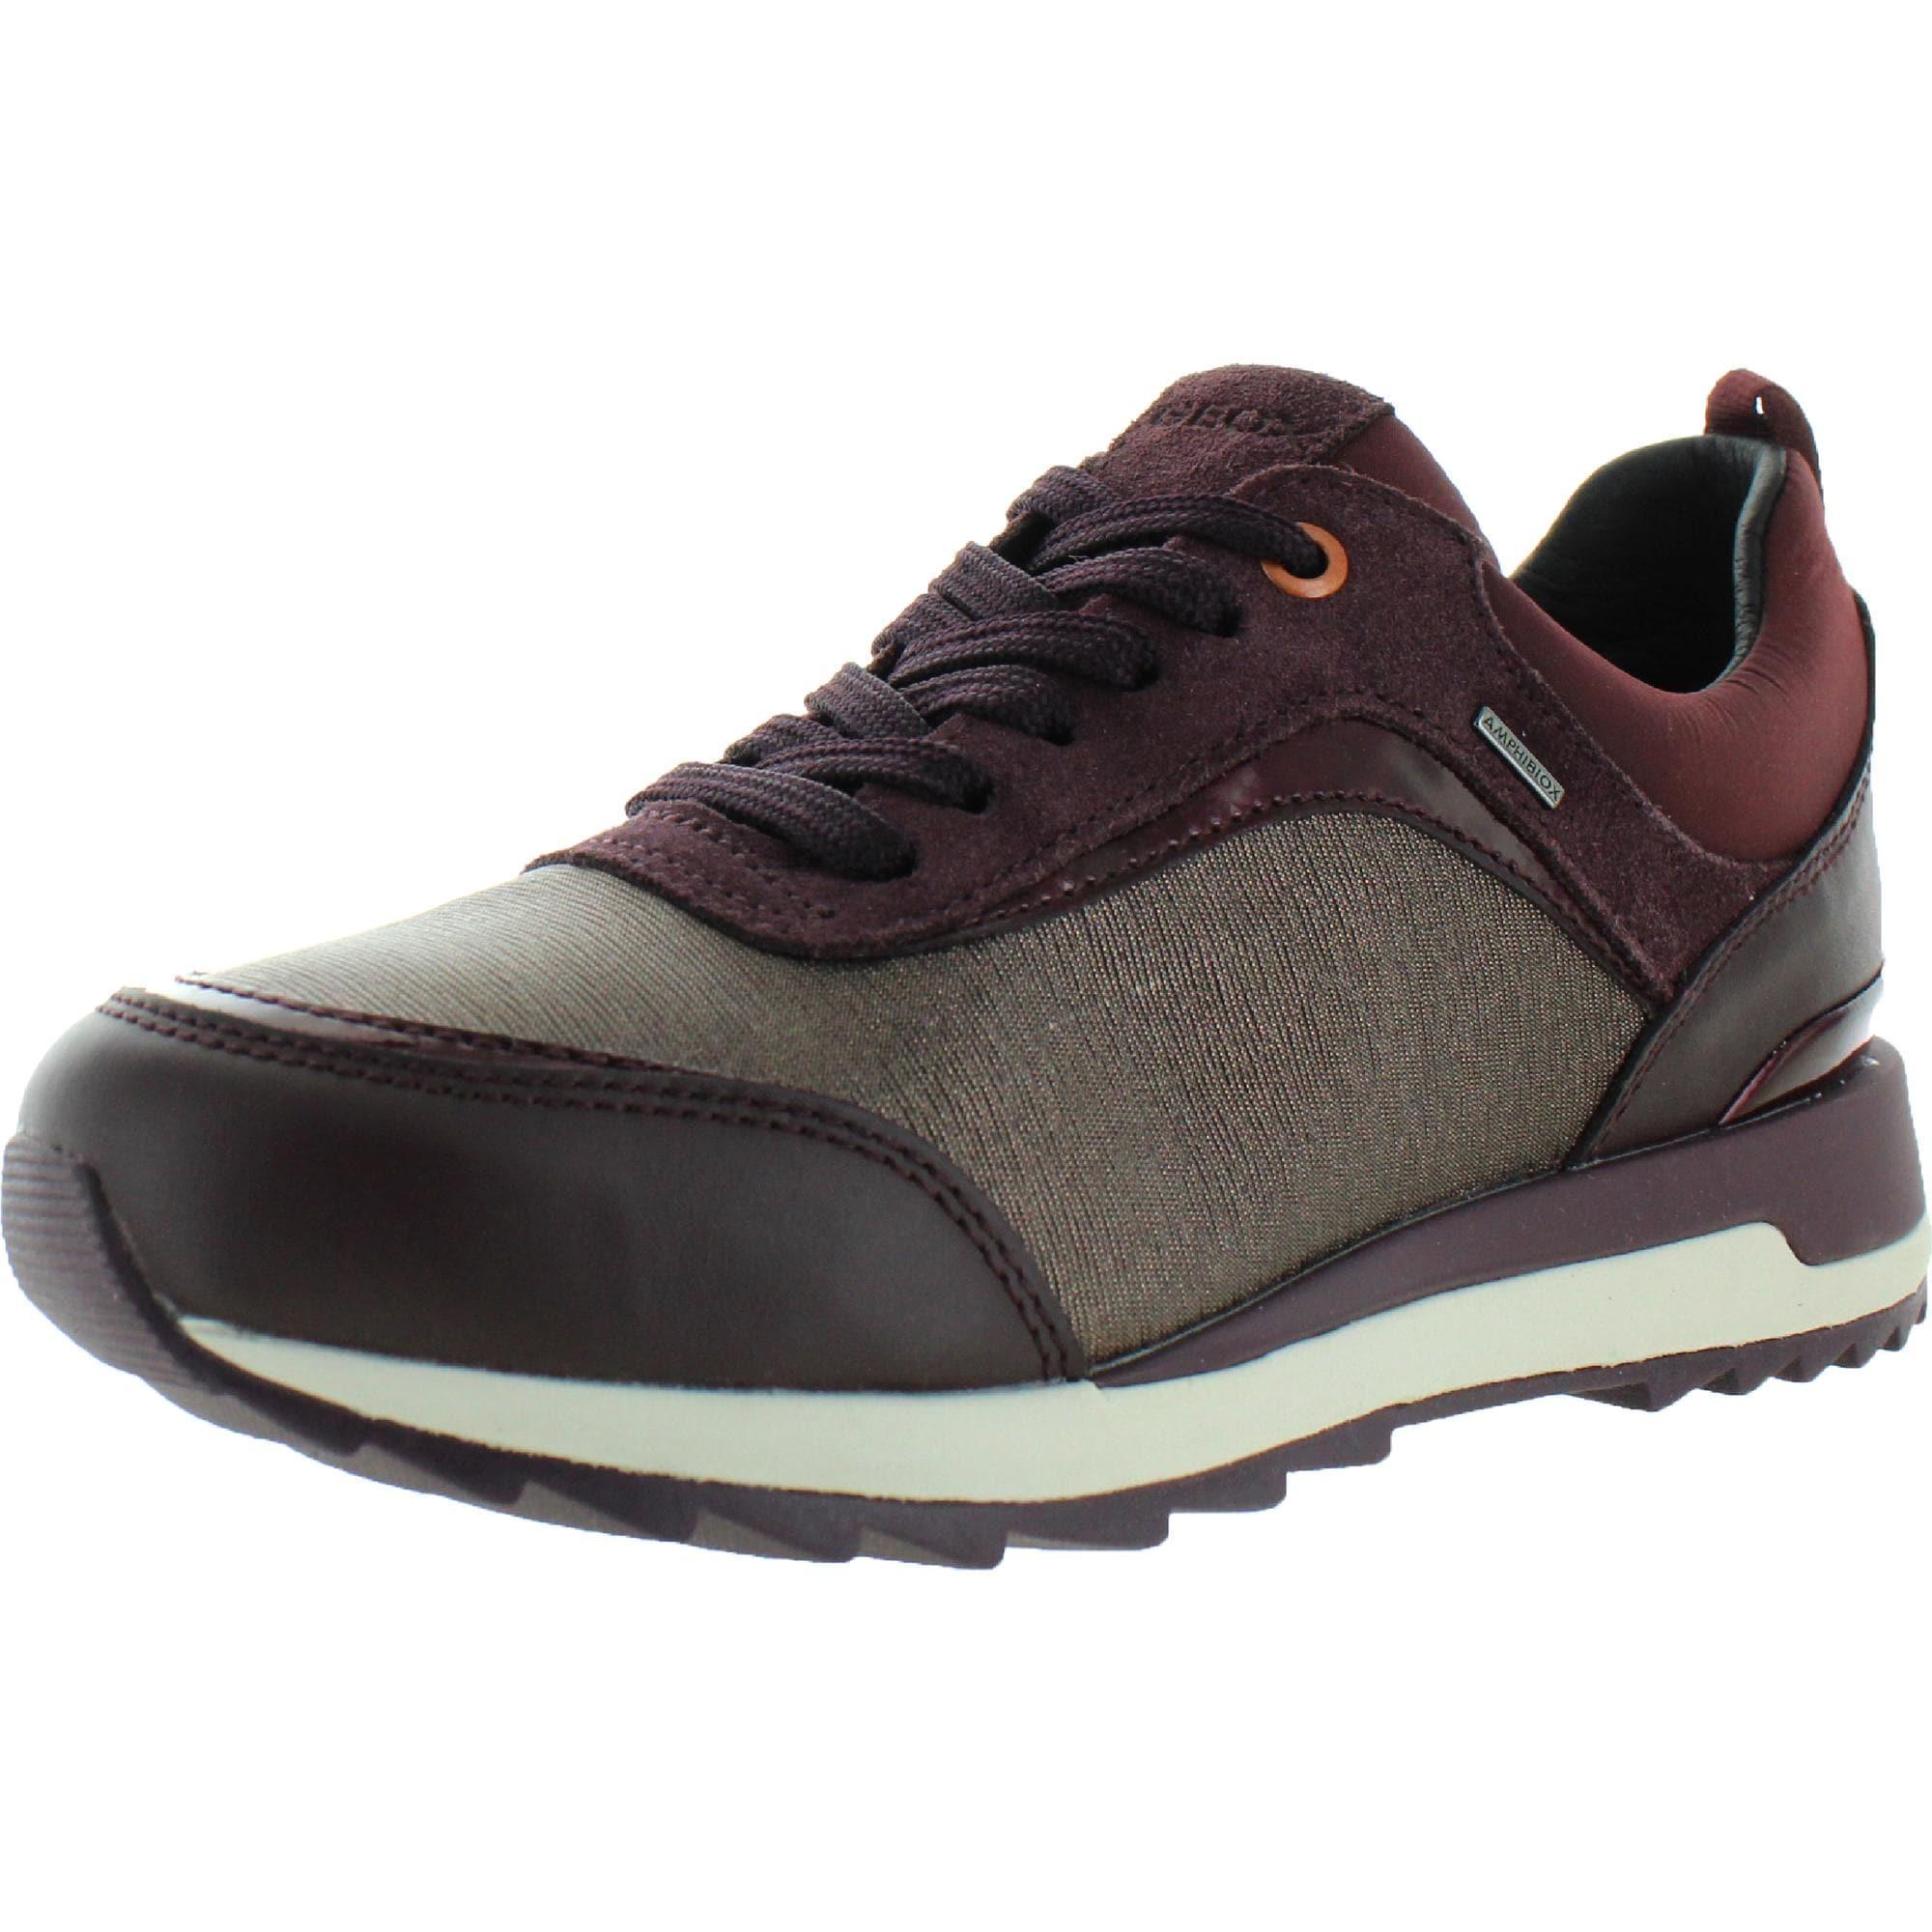 Cuervo Meseta Enfatizar  Geox Respira Womens Aneko Fashion Sneakers Suede Metallic - Coffee/Dark  Burgundy - Overstock - 32054017